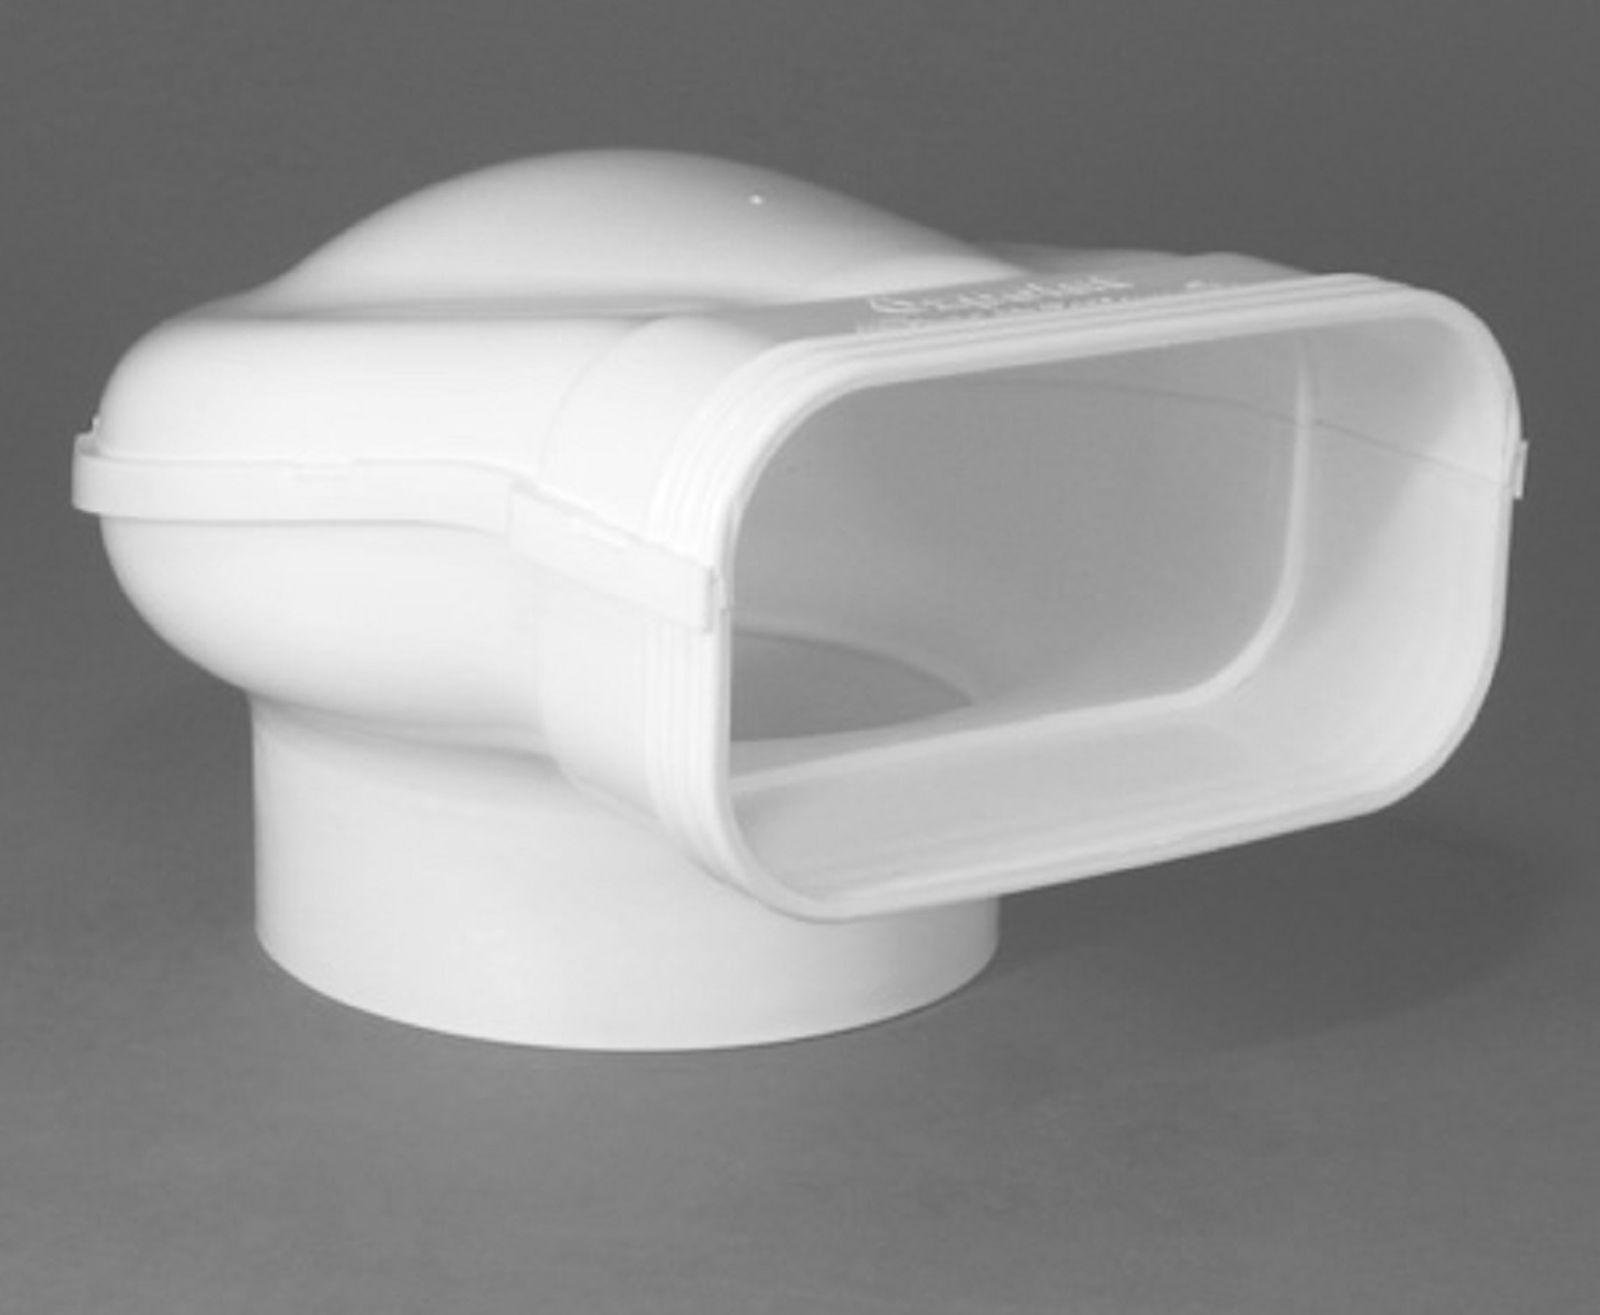 umlenkst ck proguide abluft flachkanal 150 x 70 mm zu 125 mm dunstabzug 50422 kaufen bei. Black Bedroom Furniture Sets. Home Design Ideas